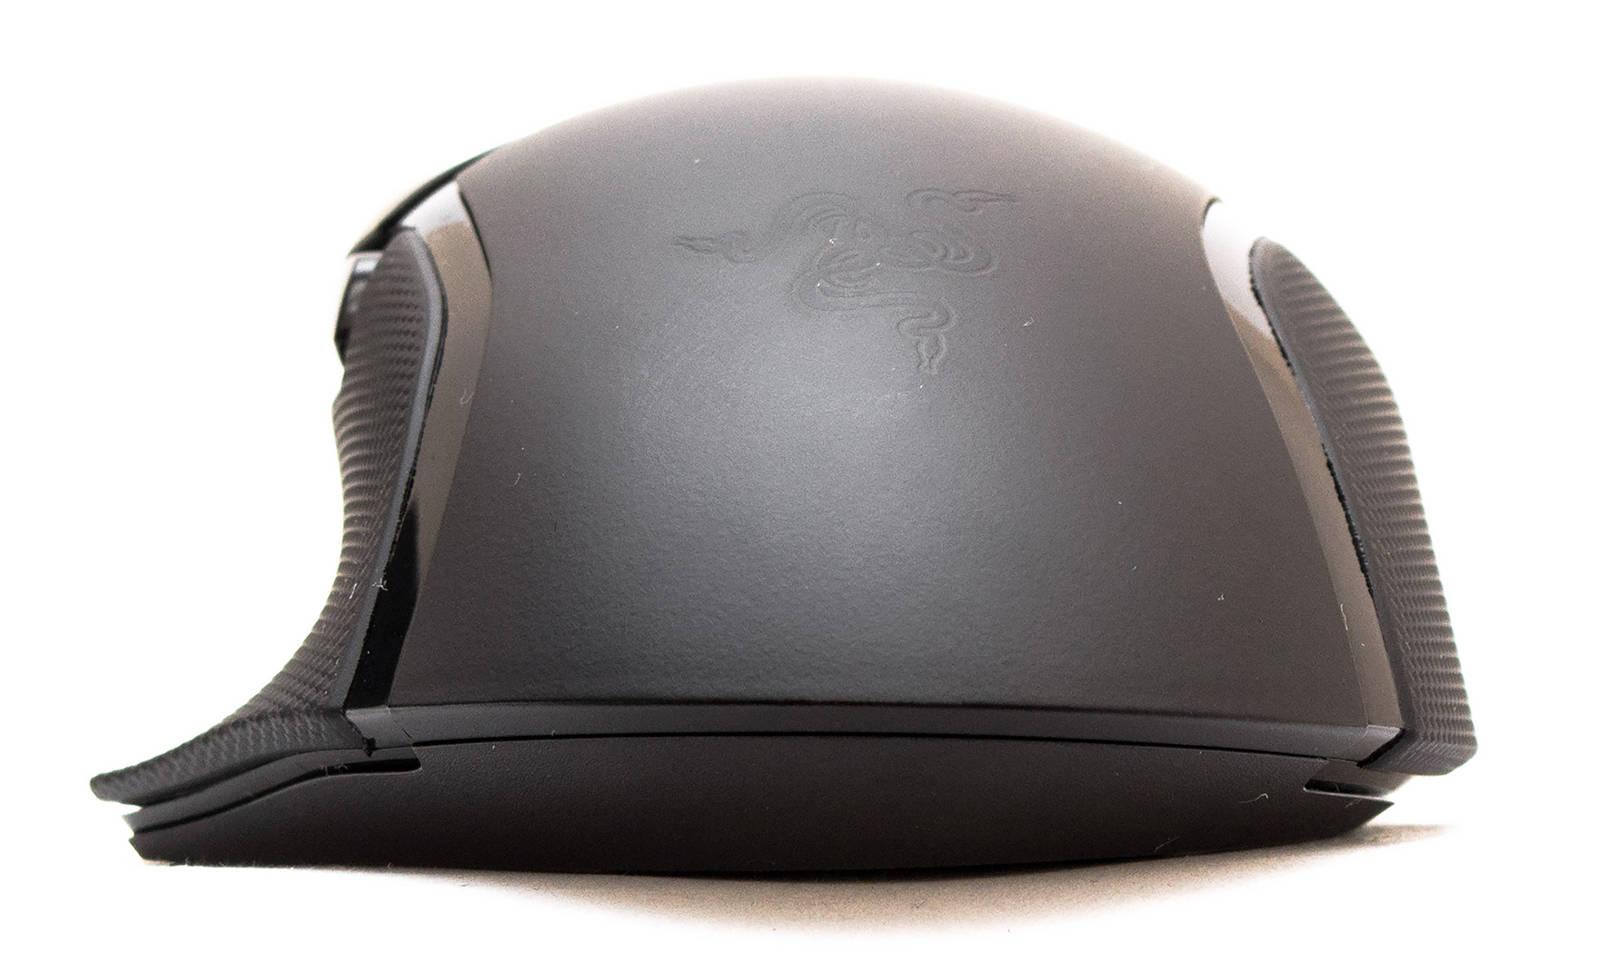 Мышь Razer Basilisk Ultimate. Фото 14